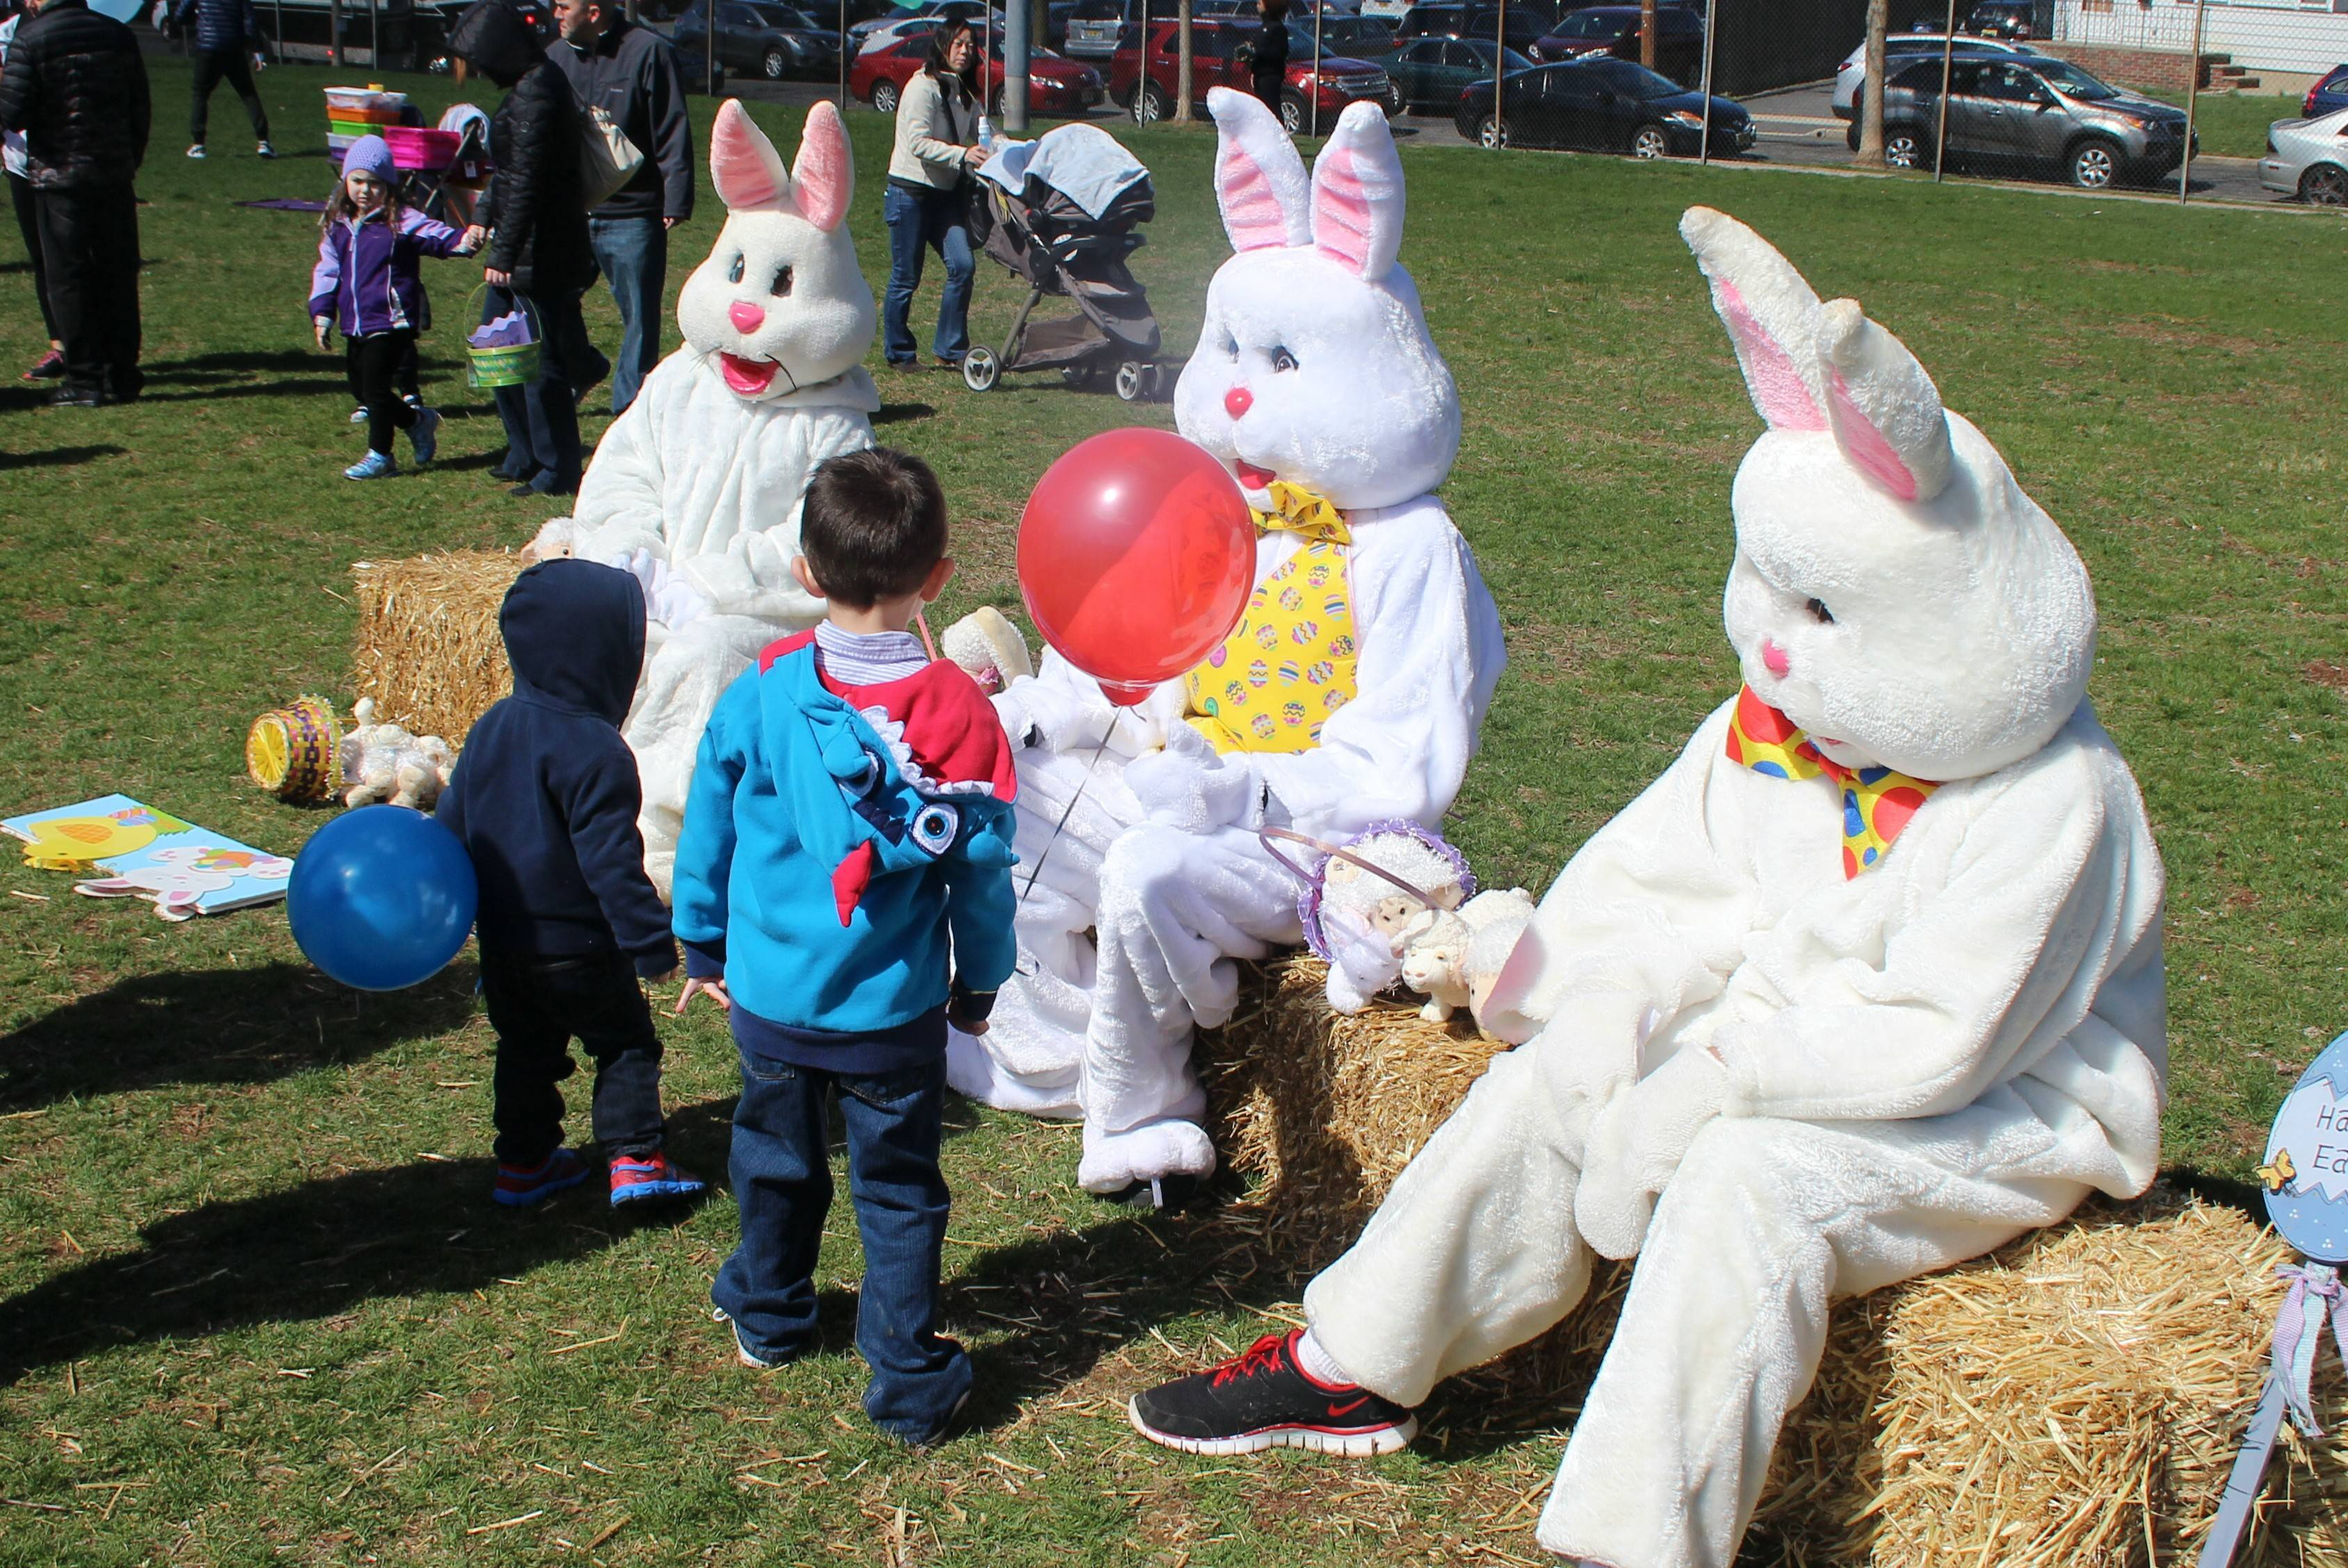 f0251e27a7753da3e3f6_Easter_Egg_Hunt_Bloomfield_Skyline_Church__051.jpg